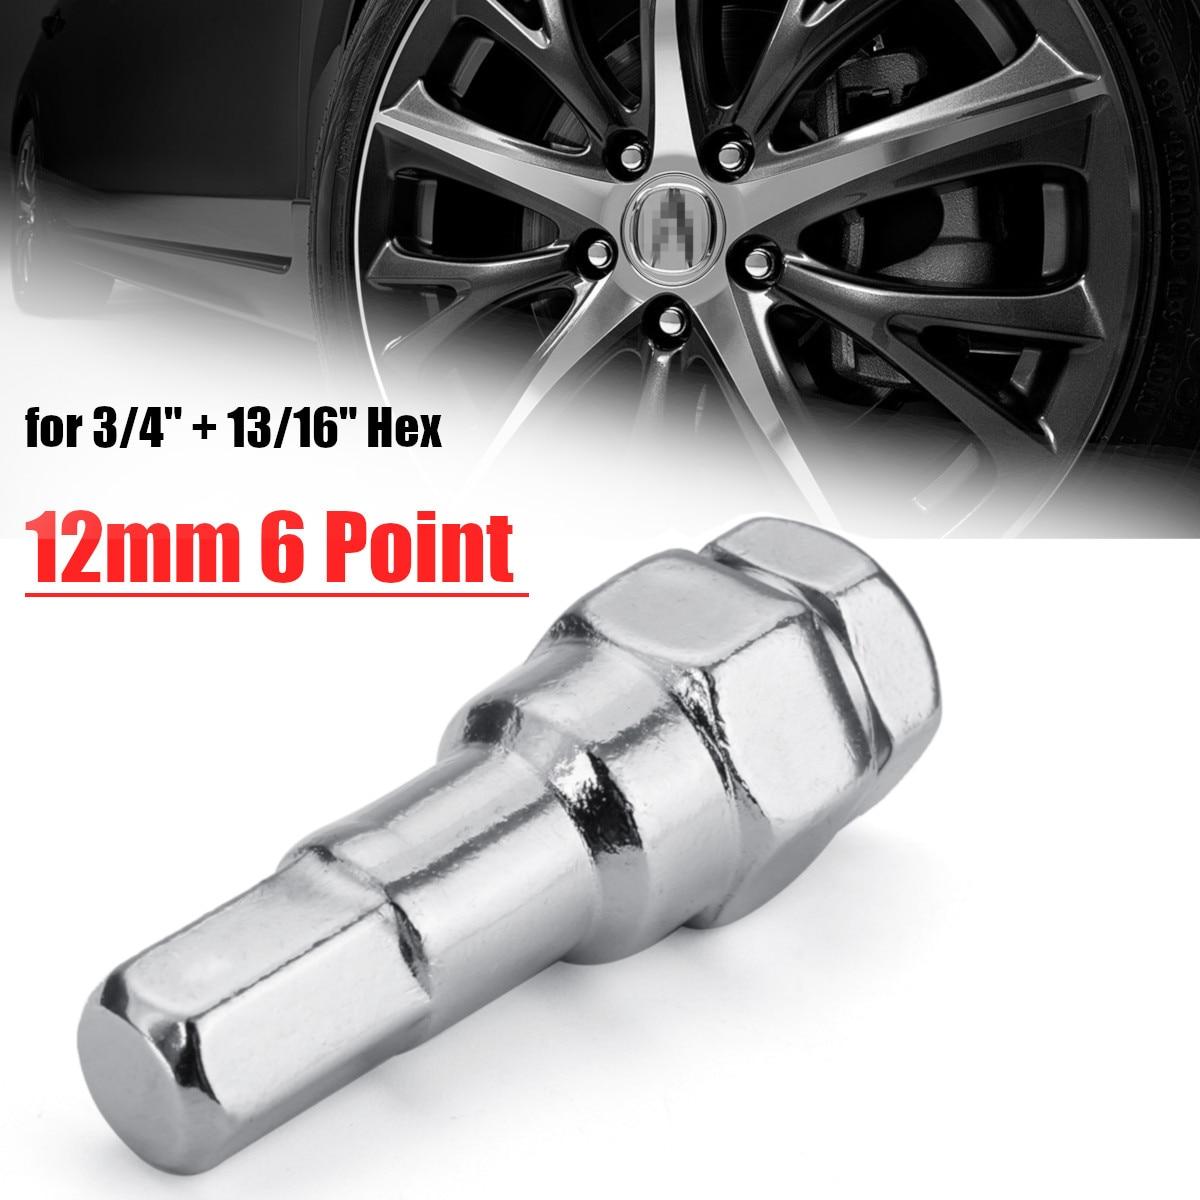 62mm 6 Point Spline Sided 12mm Hex Key Tuner Wheel Lug Nut Tool Socket Adapter Wrench